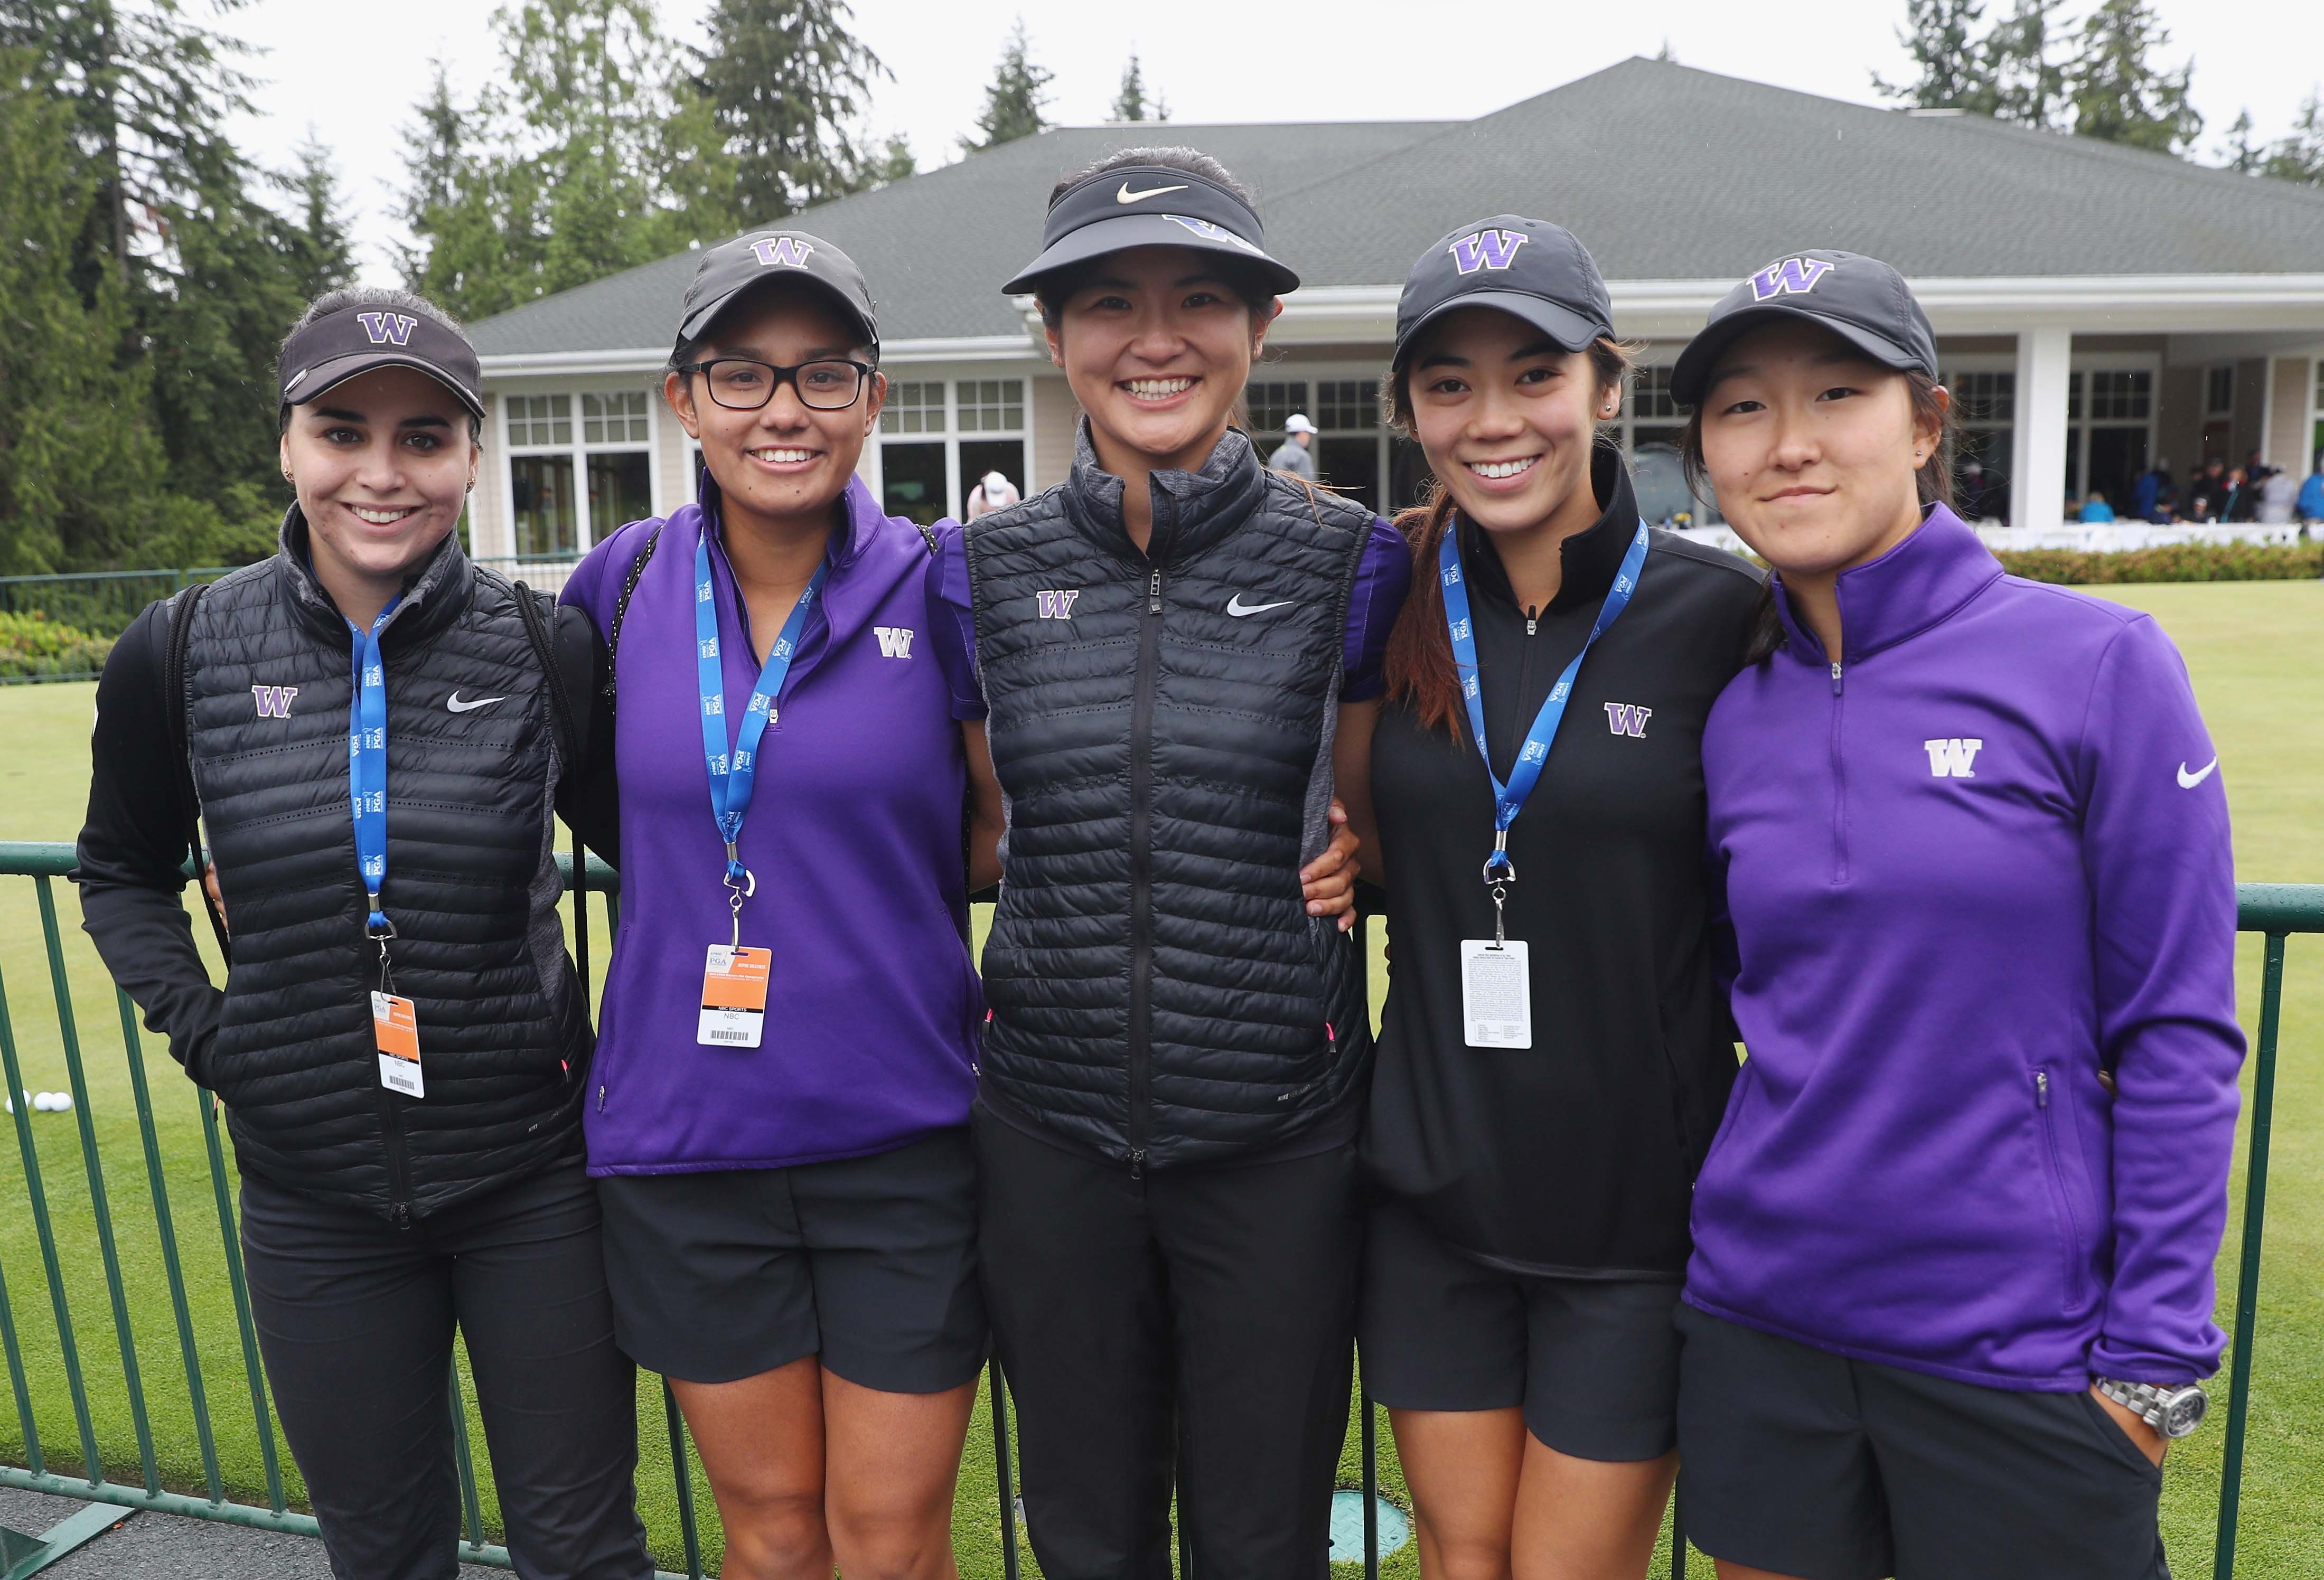 University of Washington women's golf team